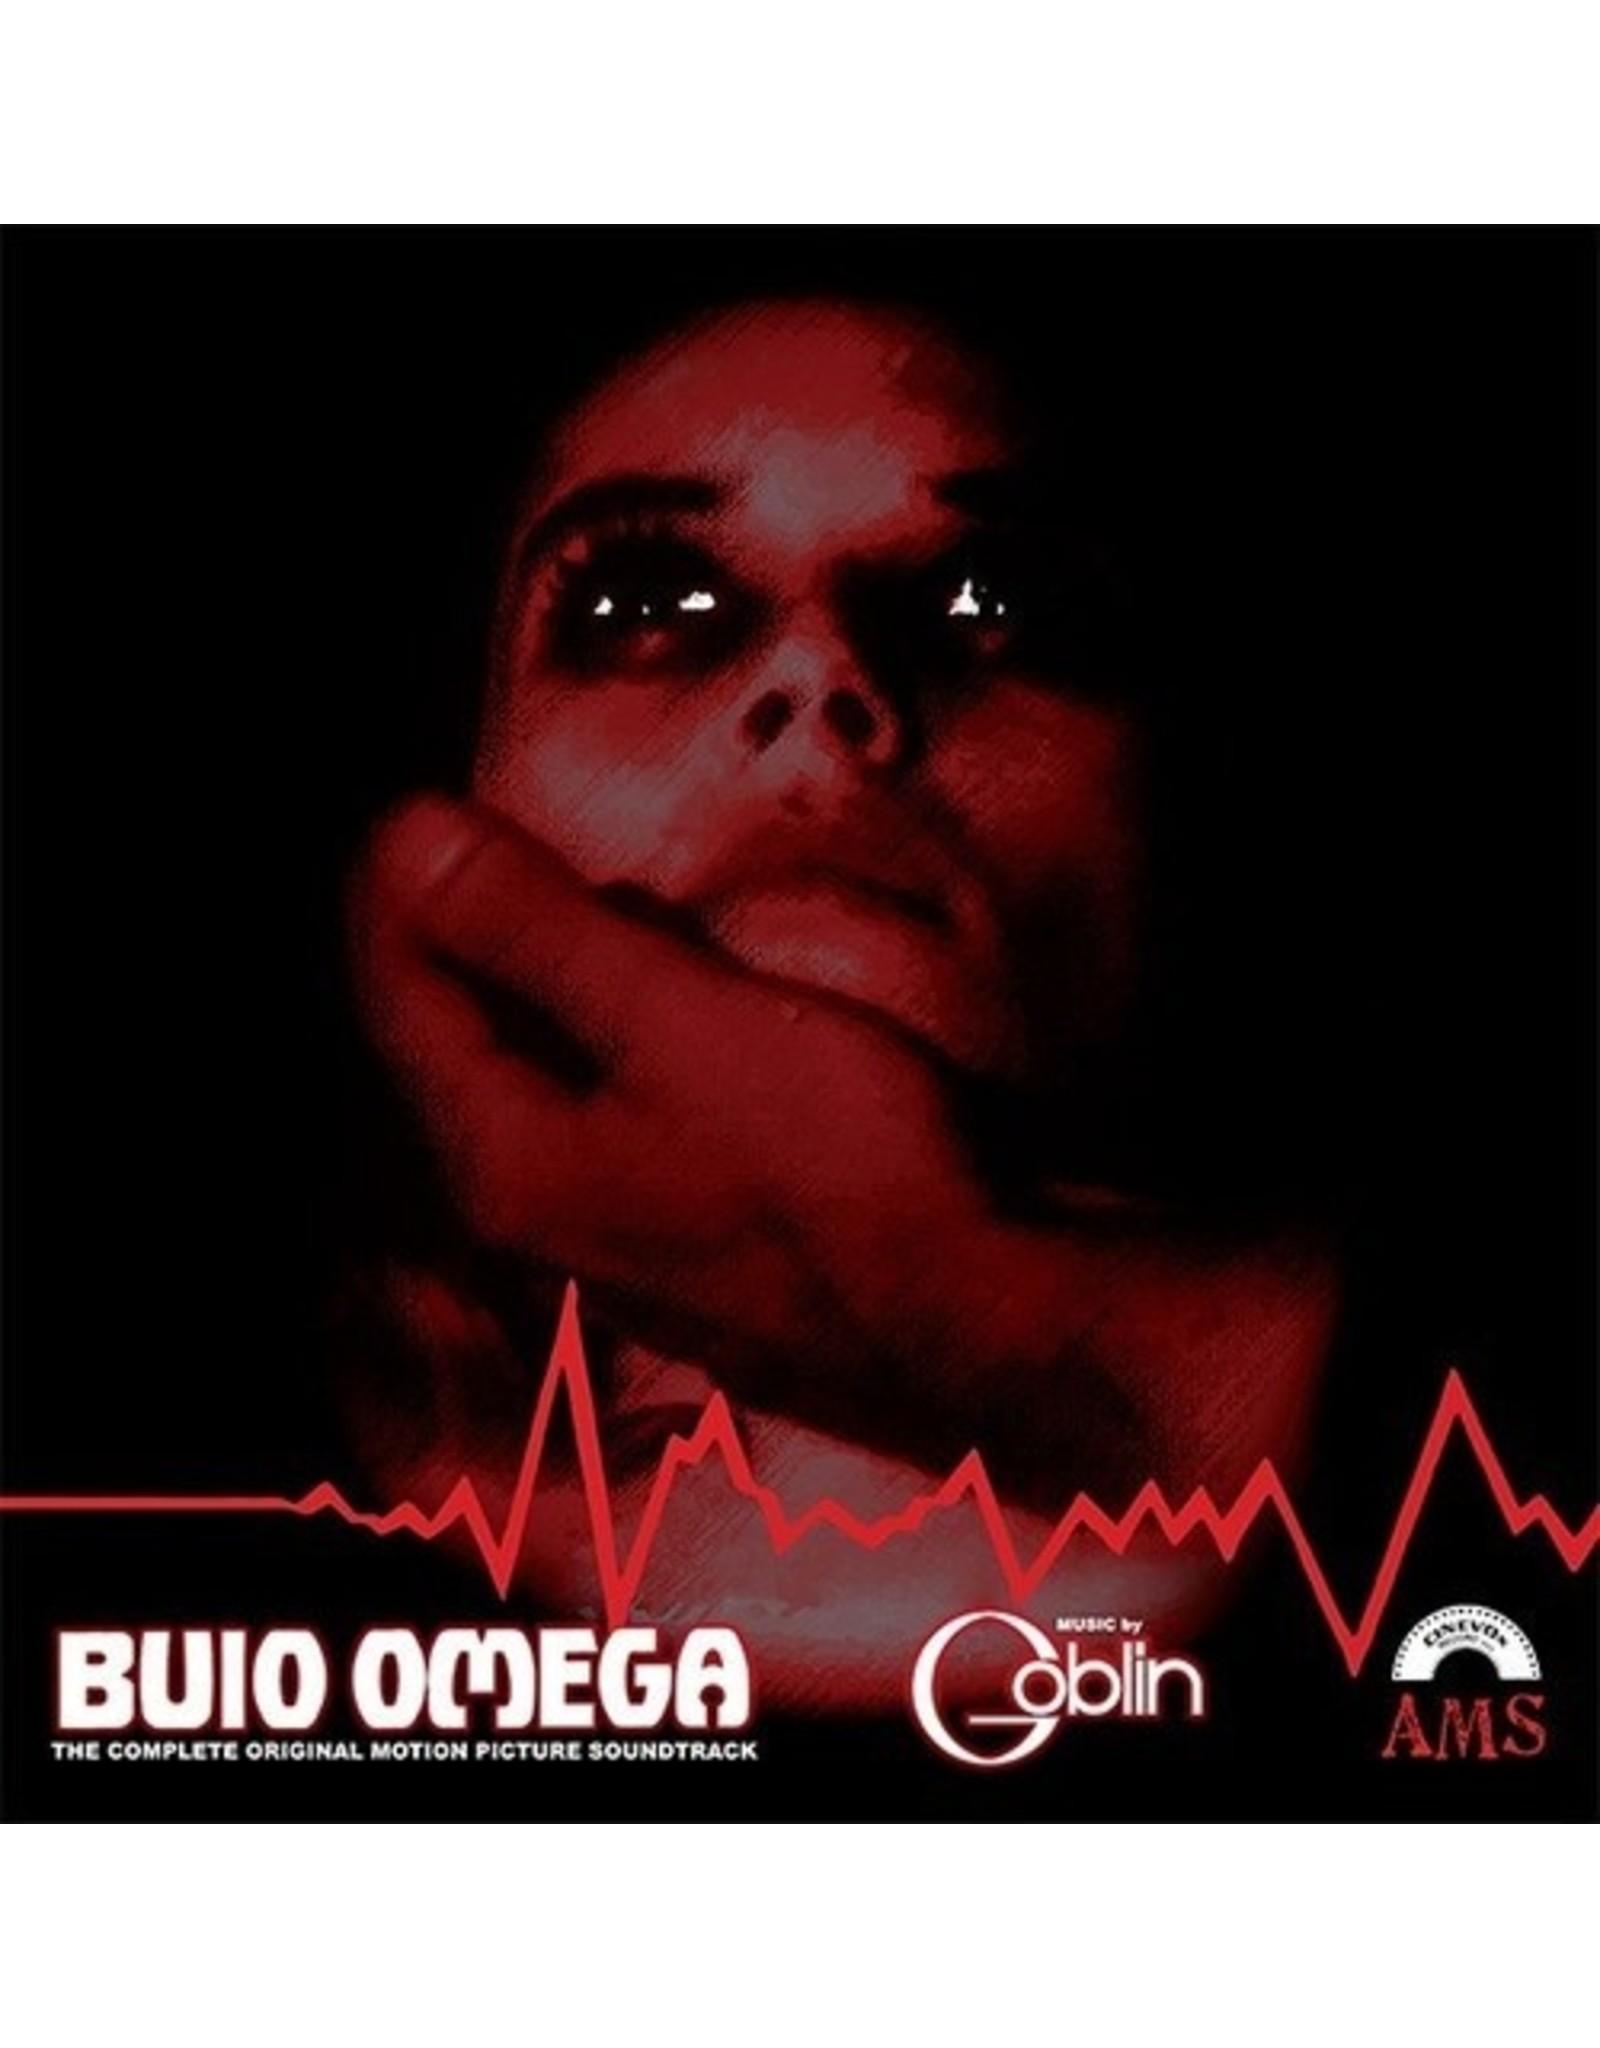 New Vinyl Goblin - Buio Omega OST LP